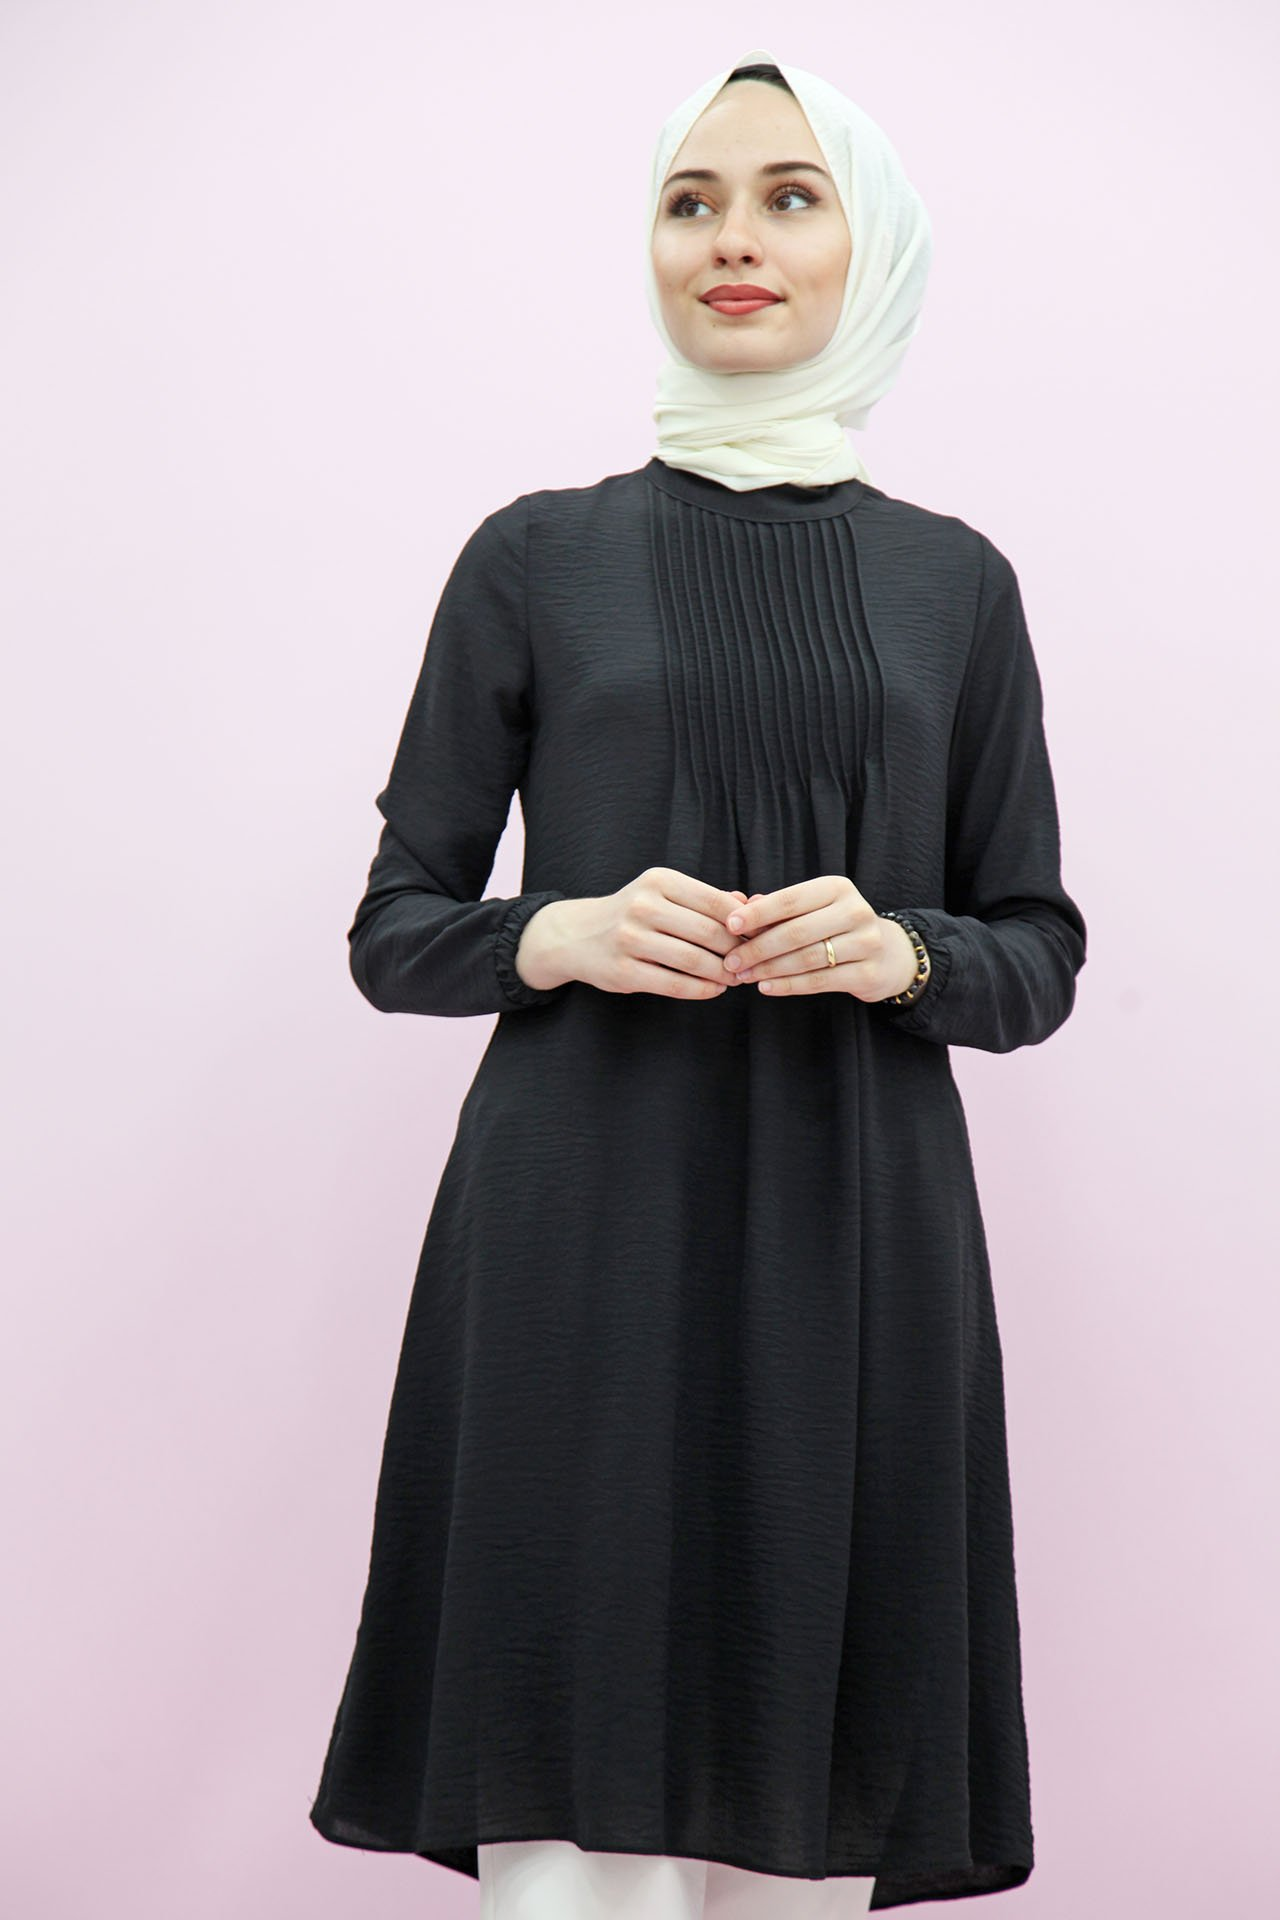 GİZAGİYİM - Kol Ucu Lastikli Tunik Siyah